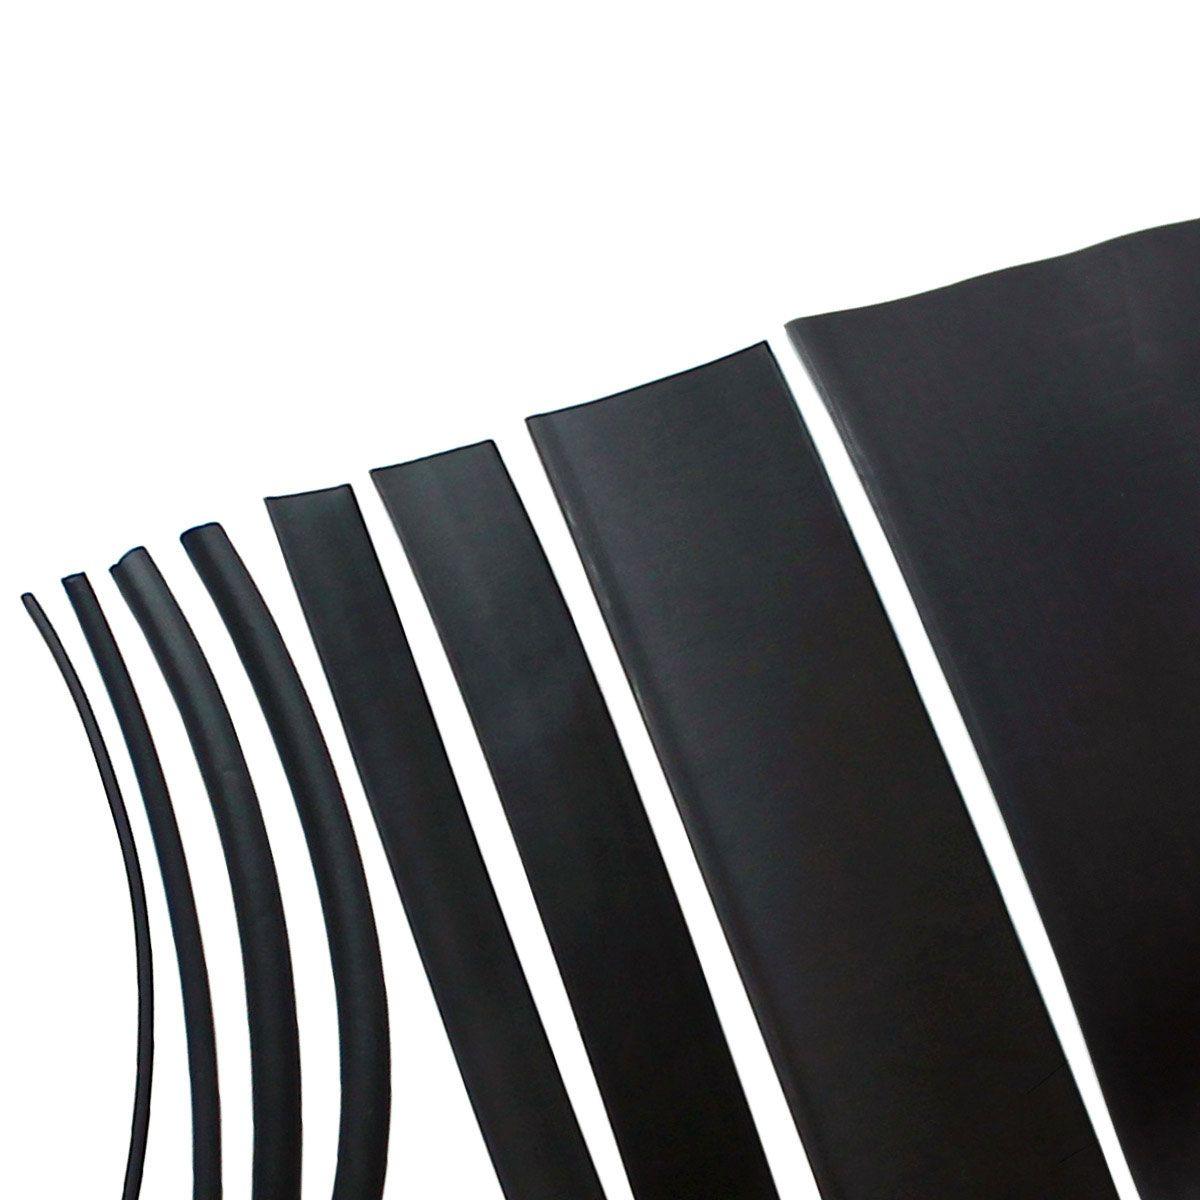 Espaguete Isolante / Tubo Termo Retrátil Espessura 8mm | Comprimento 1 Metro